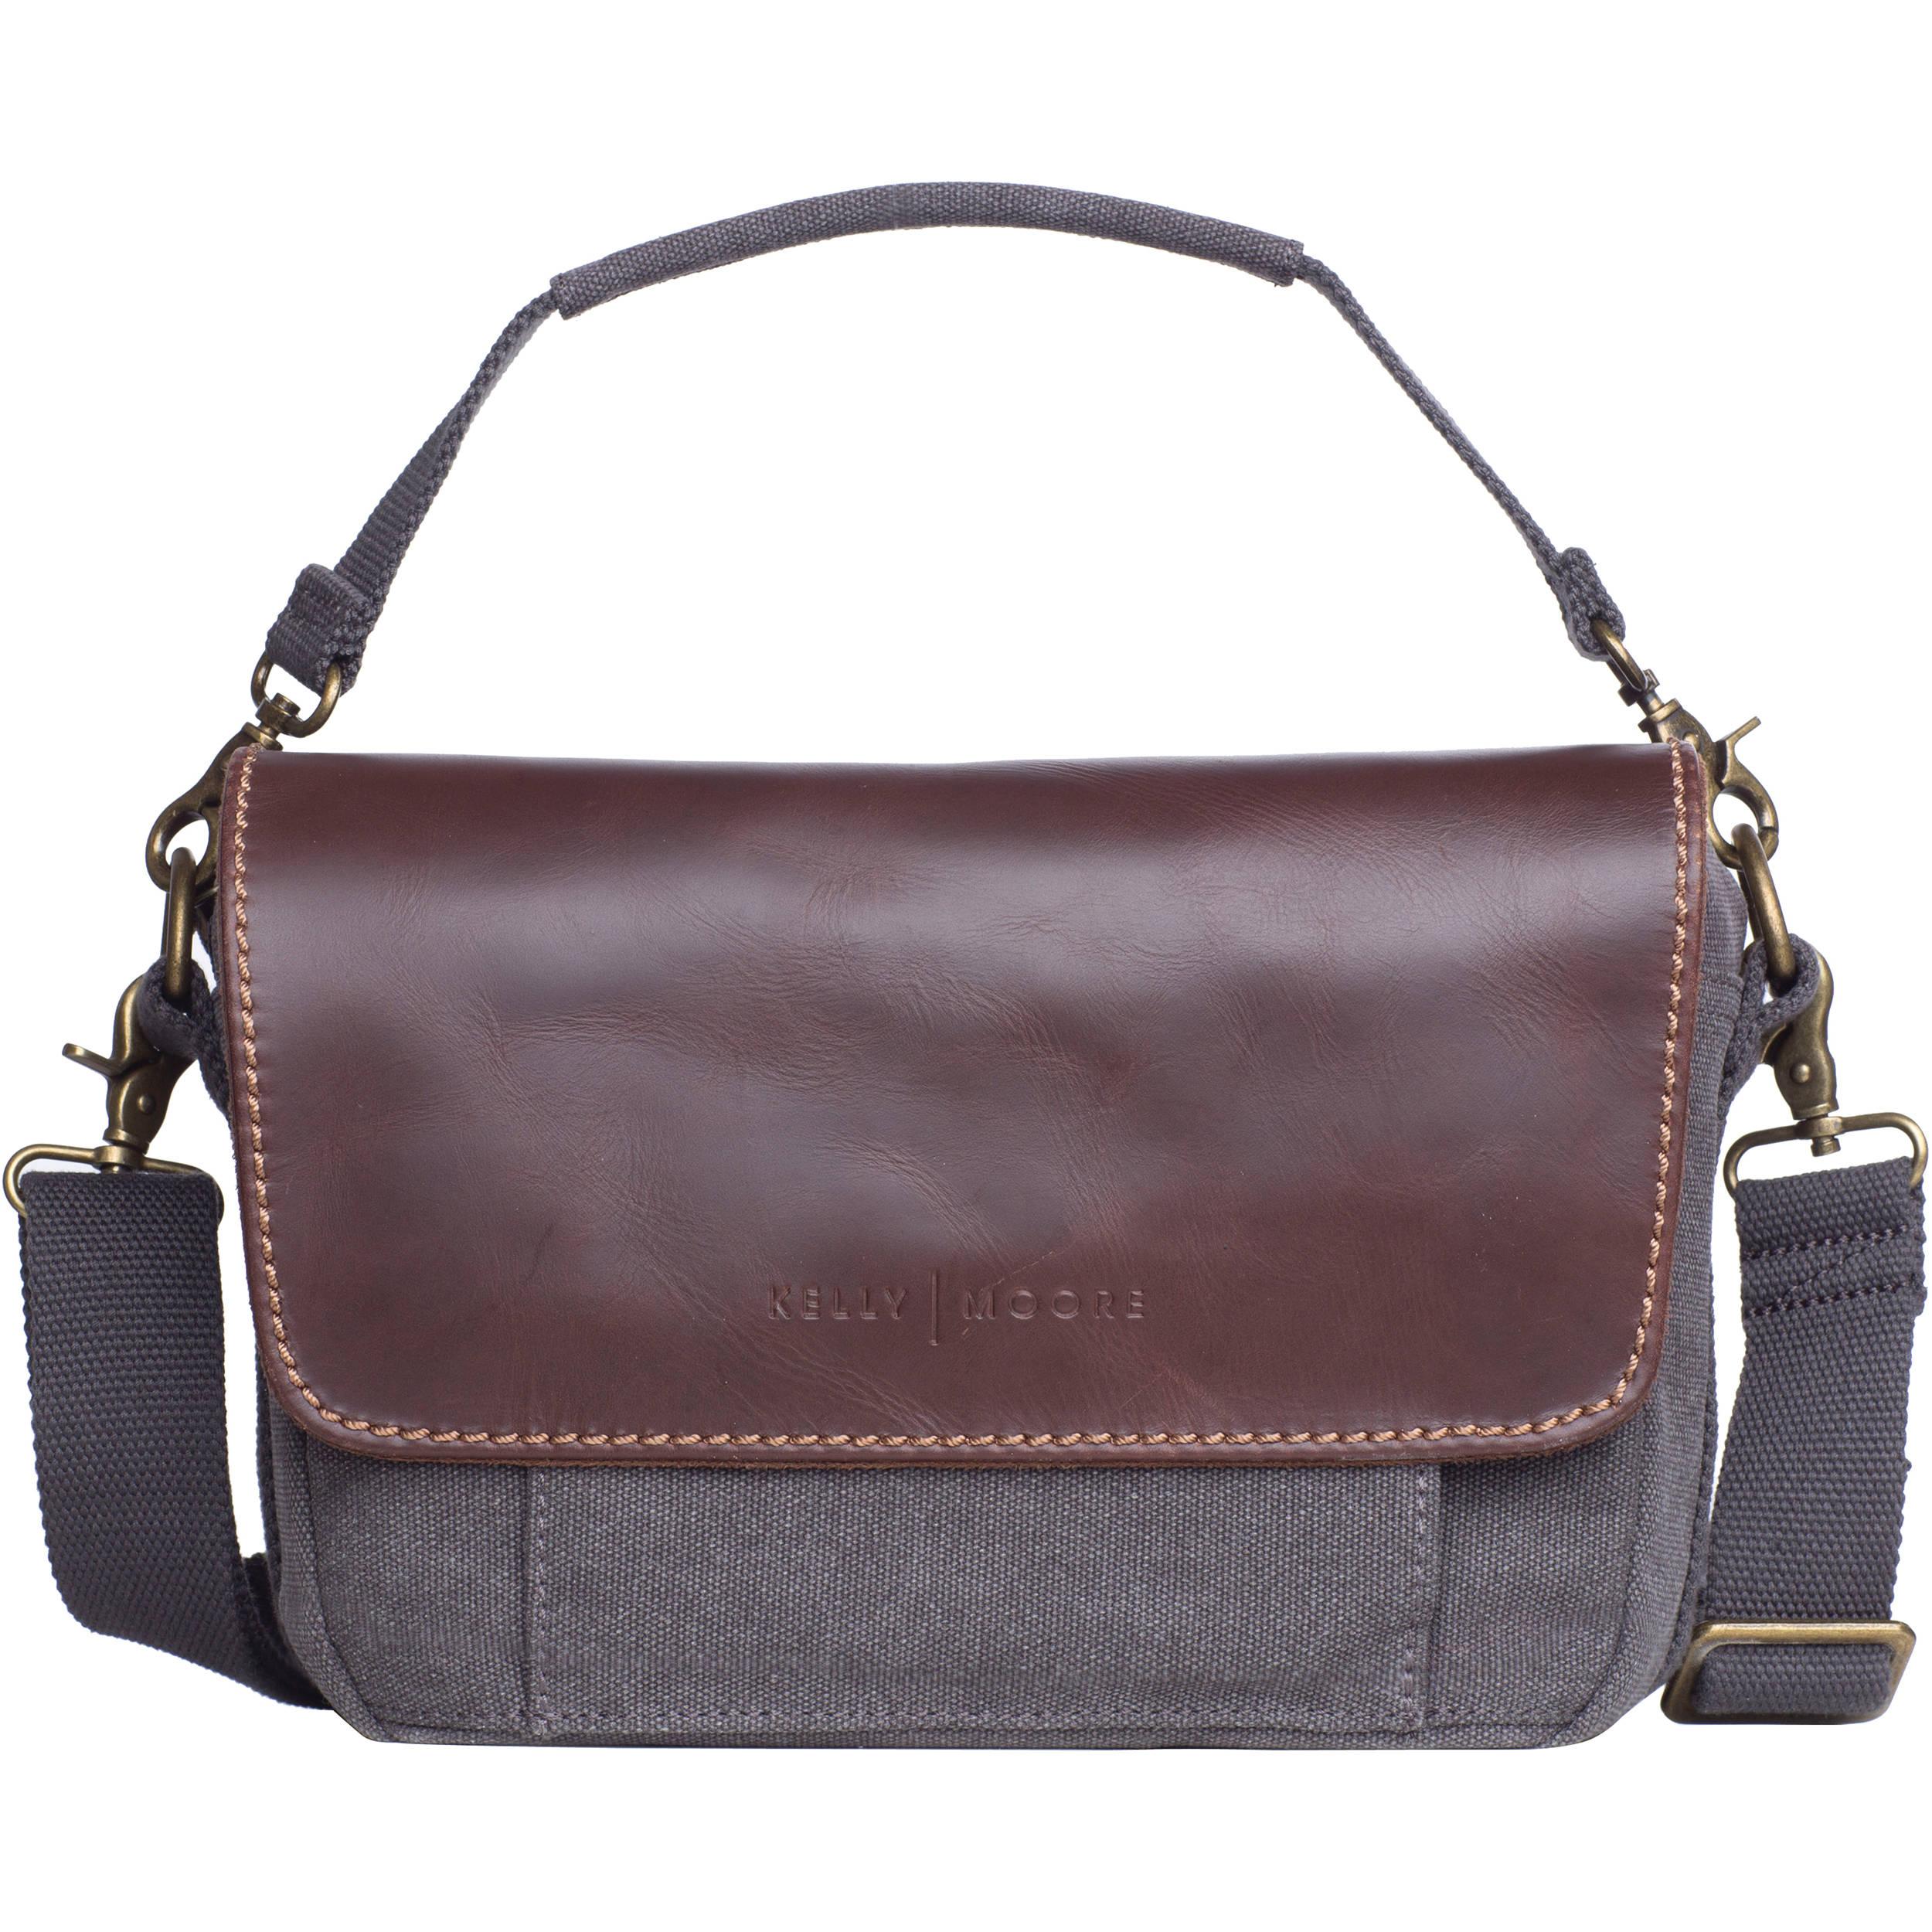 Kelly Moore Bag Followell Shoulder